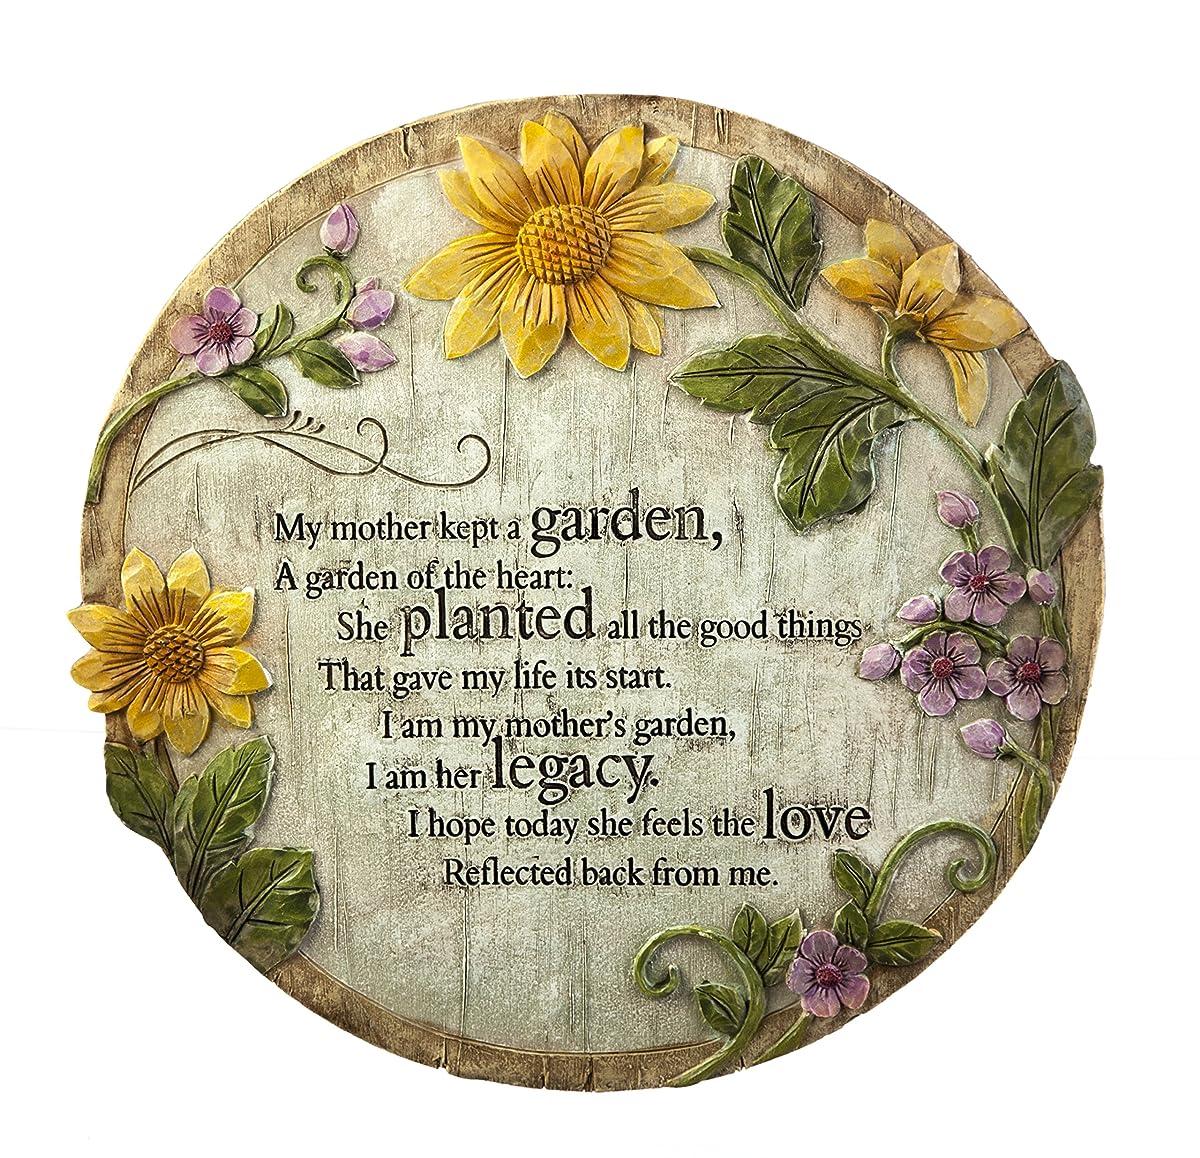 "Evergreen Garden Mother's Garden Polystone Memorial Stepping Stone - 12""W x 0.5""D x 12""H"